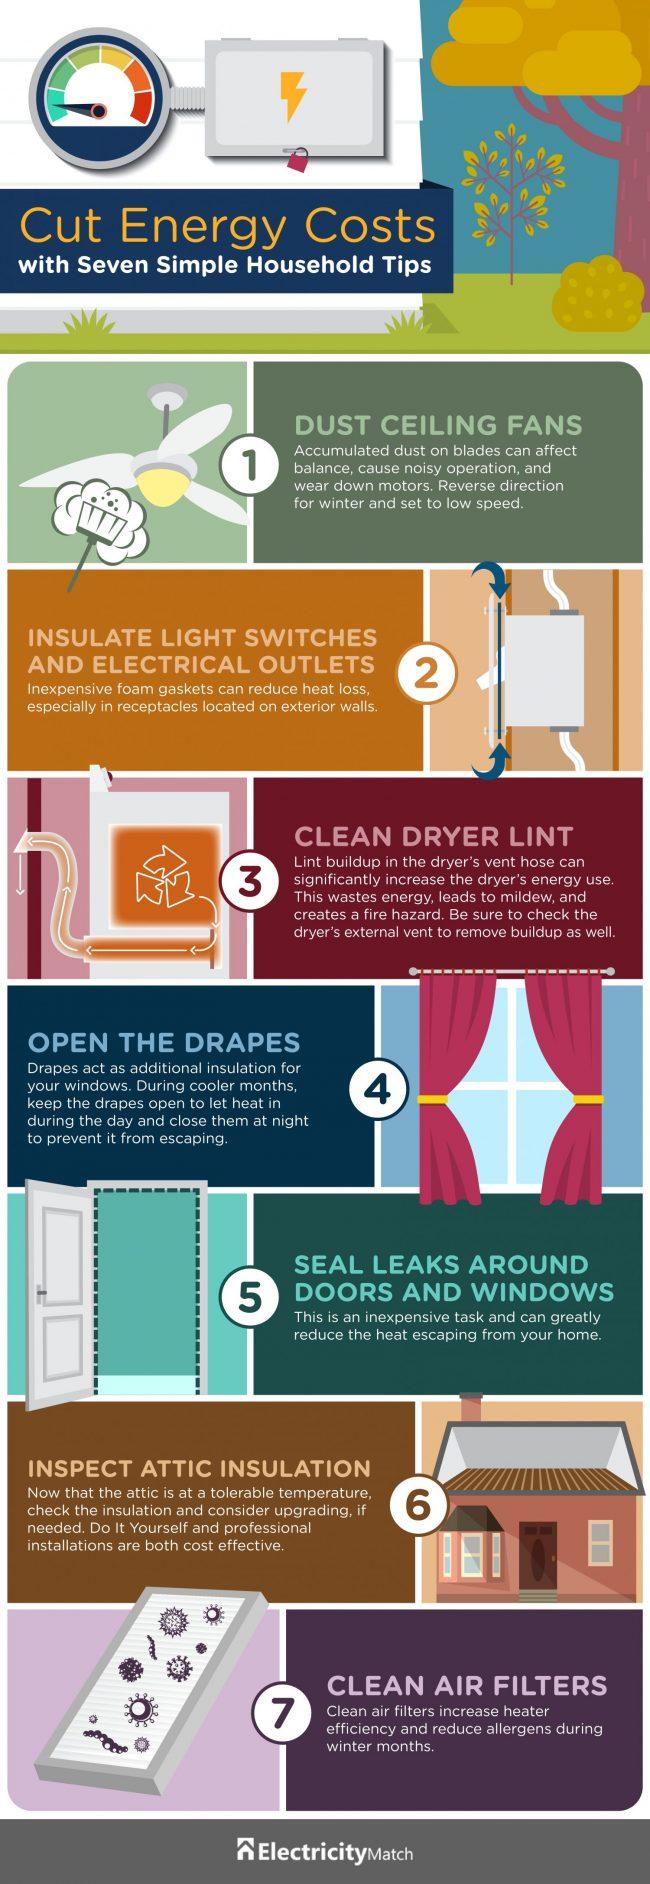 Fall Energy Savings Tips